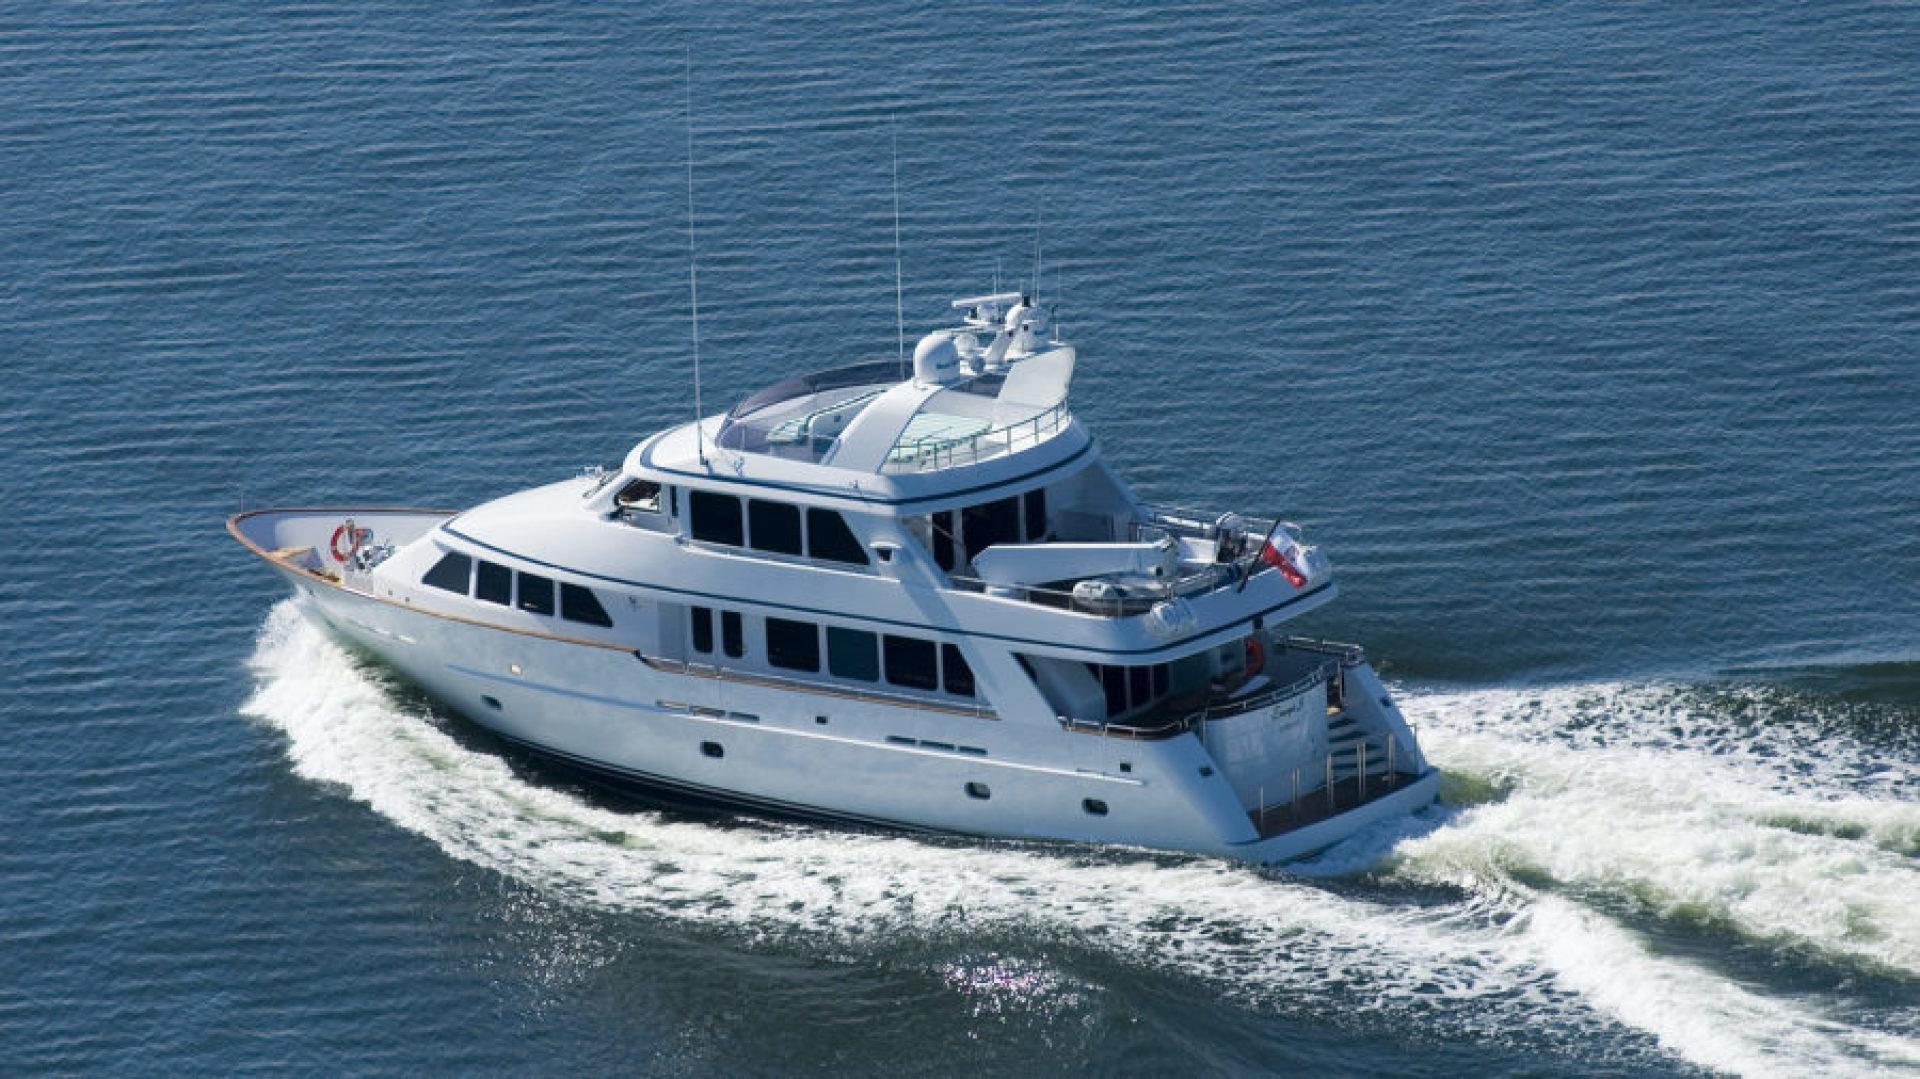 Conrad Shipyard-88 Motor Yacht 2005-Chillin Fort Lauderdale-Florida-United States-Conrad Motor Yacht 2005 Chillin-1537333 | Thumbnail